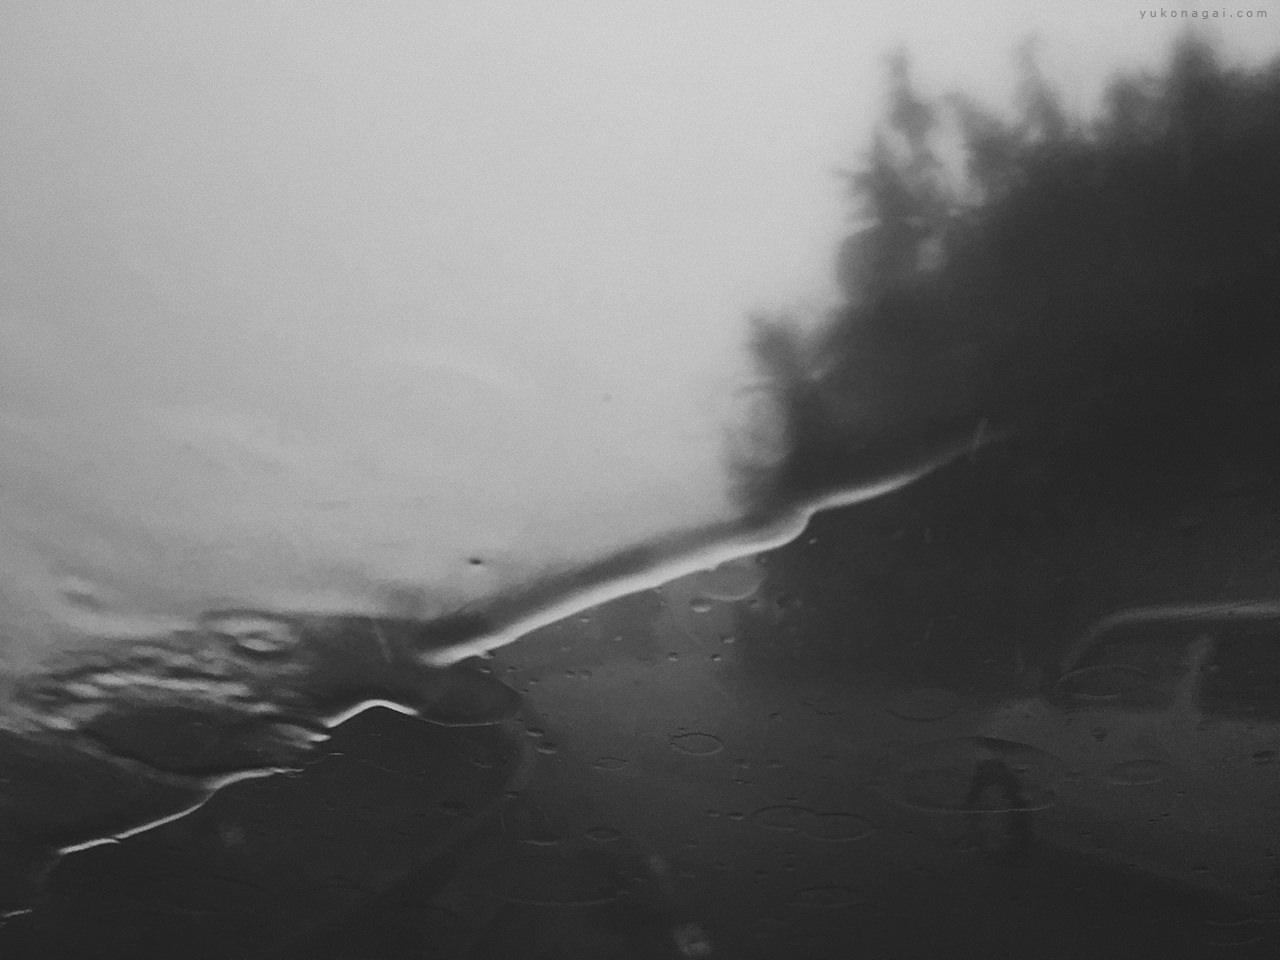 A windshield pattern on rainy drive.